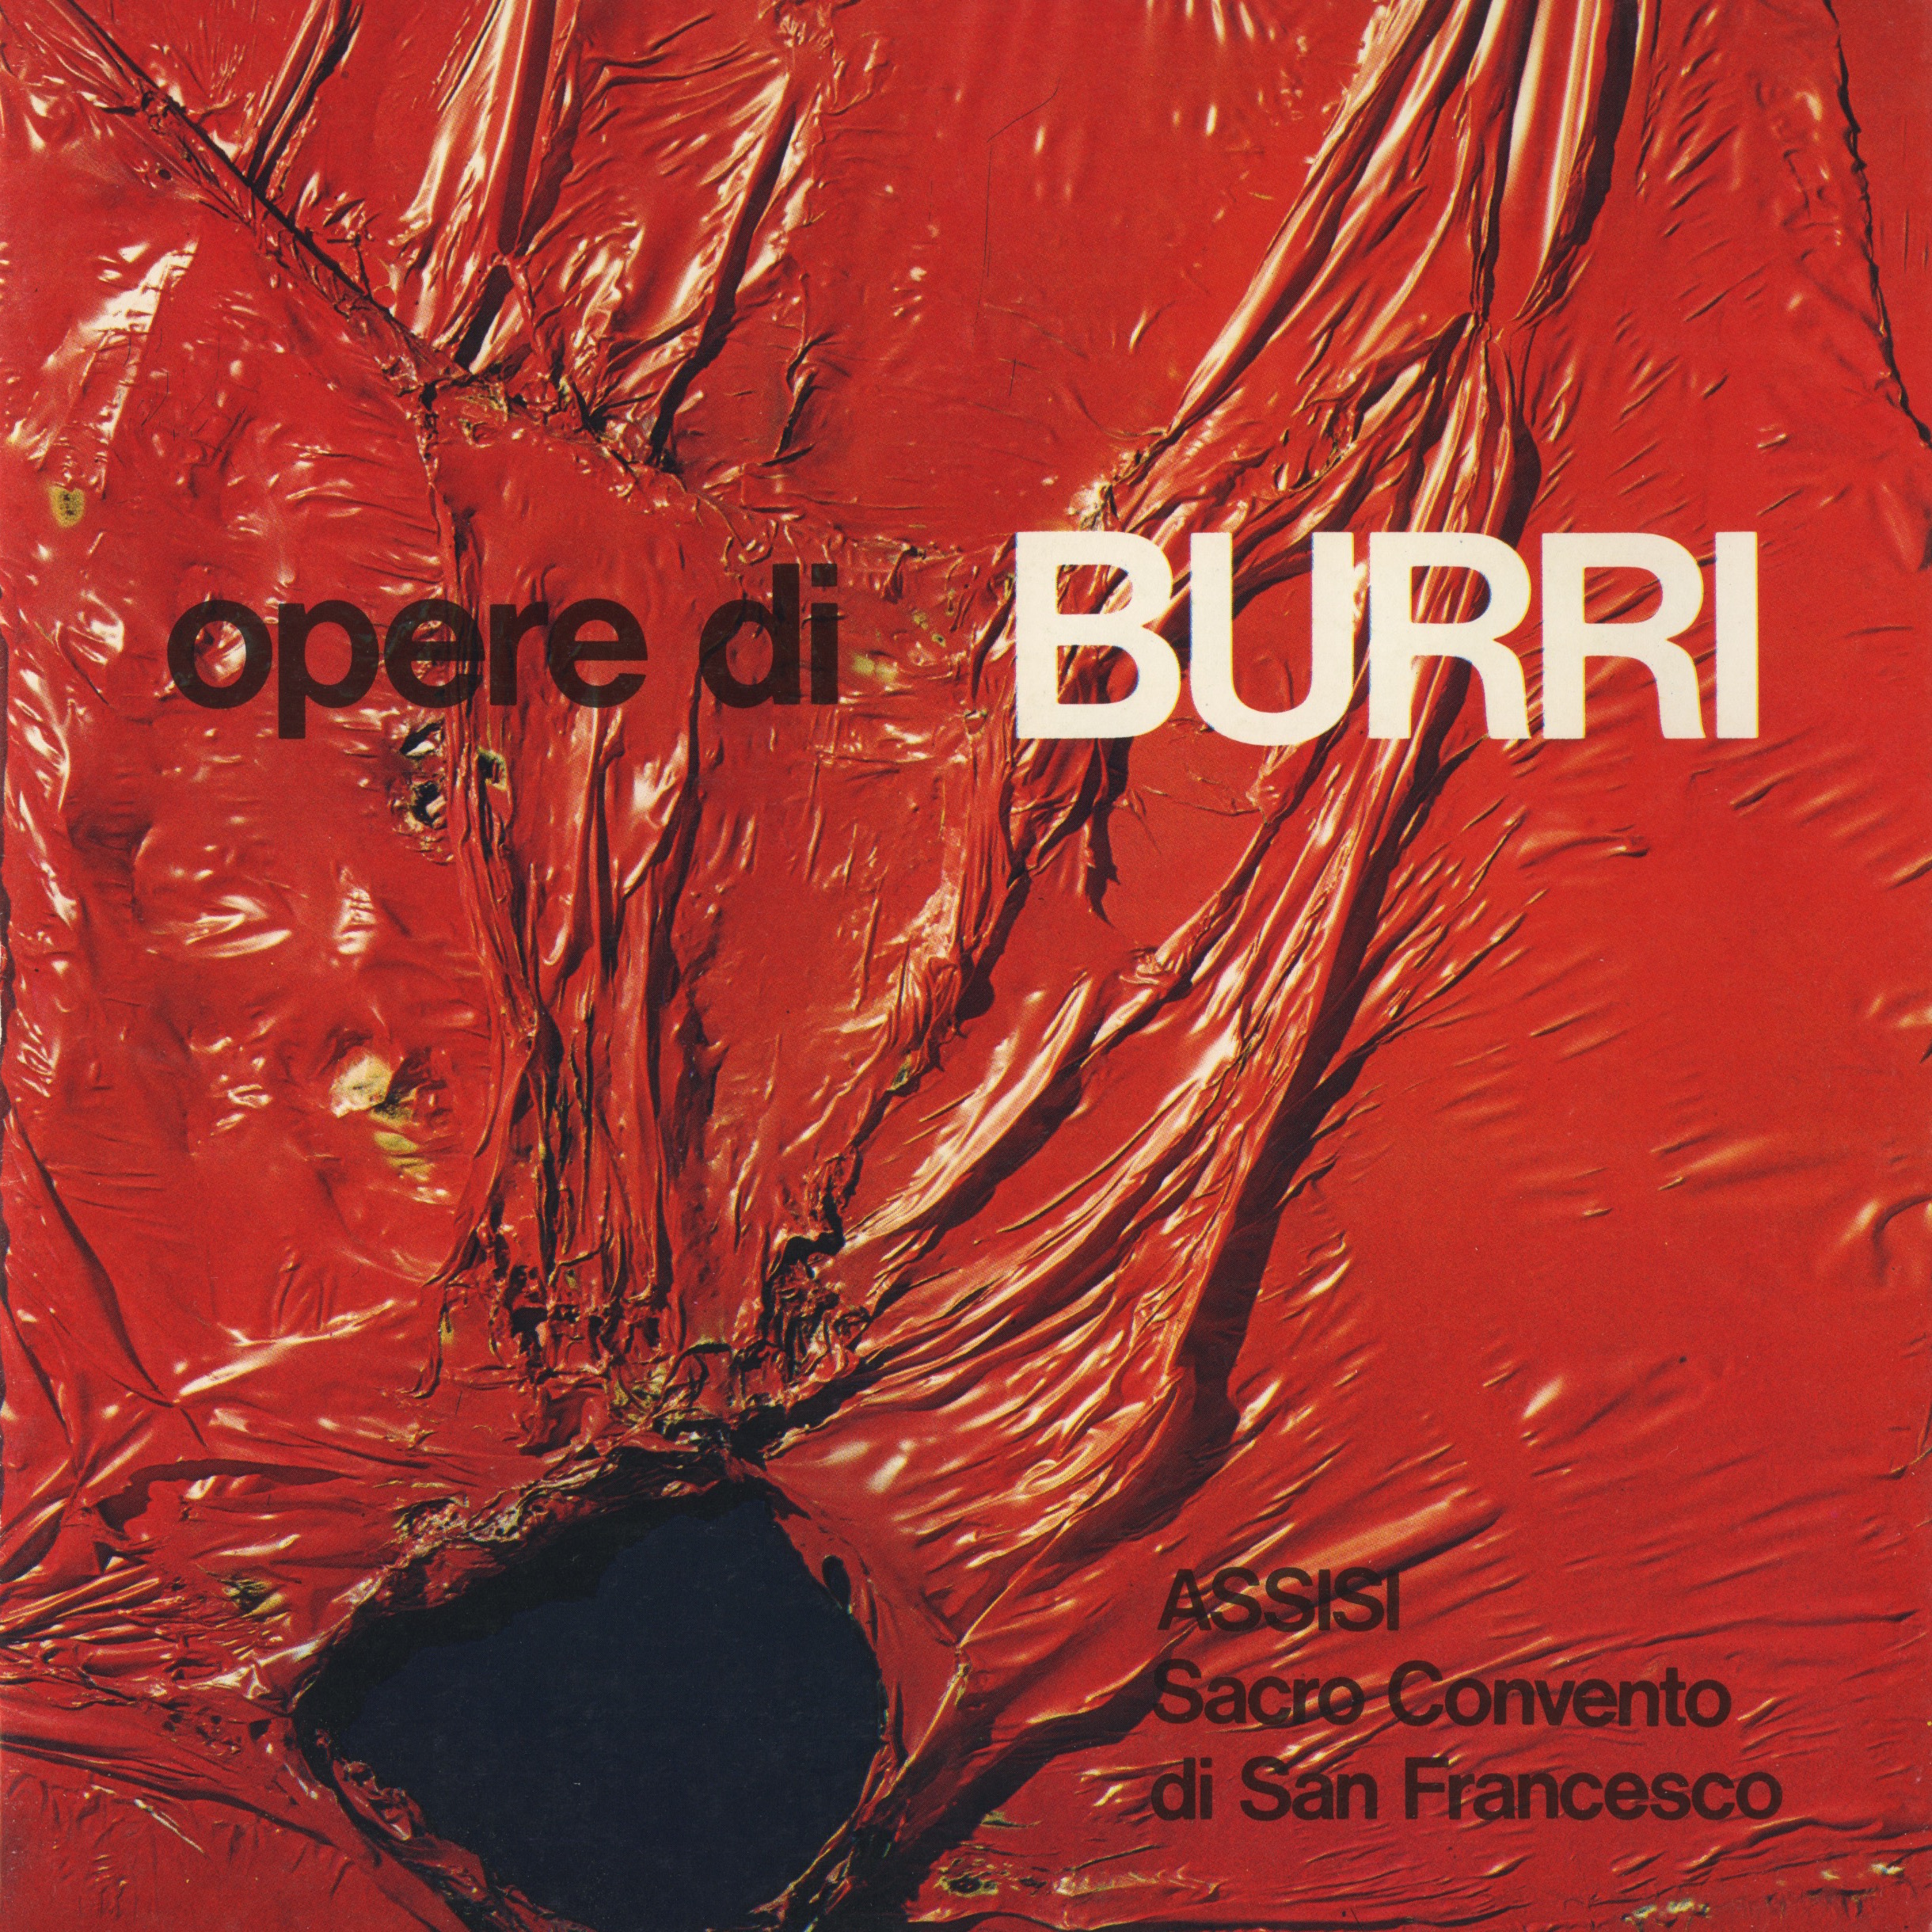 Mostra_Opere_di_Burri_Sacro_Convento_S._Francesco_Assisi_1975